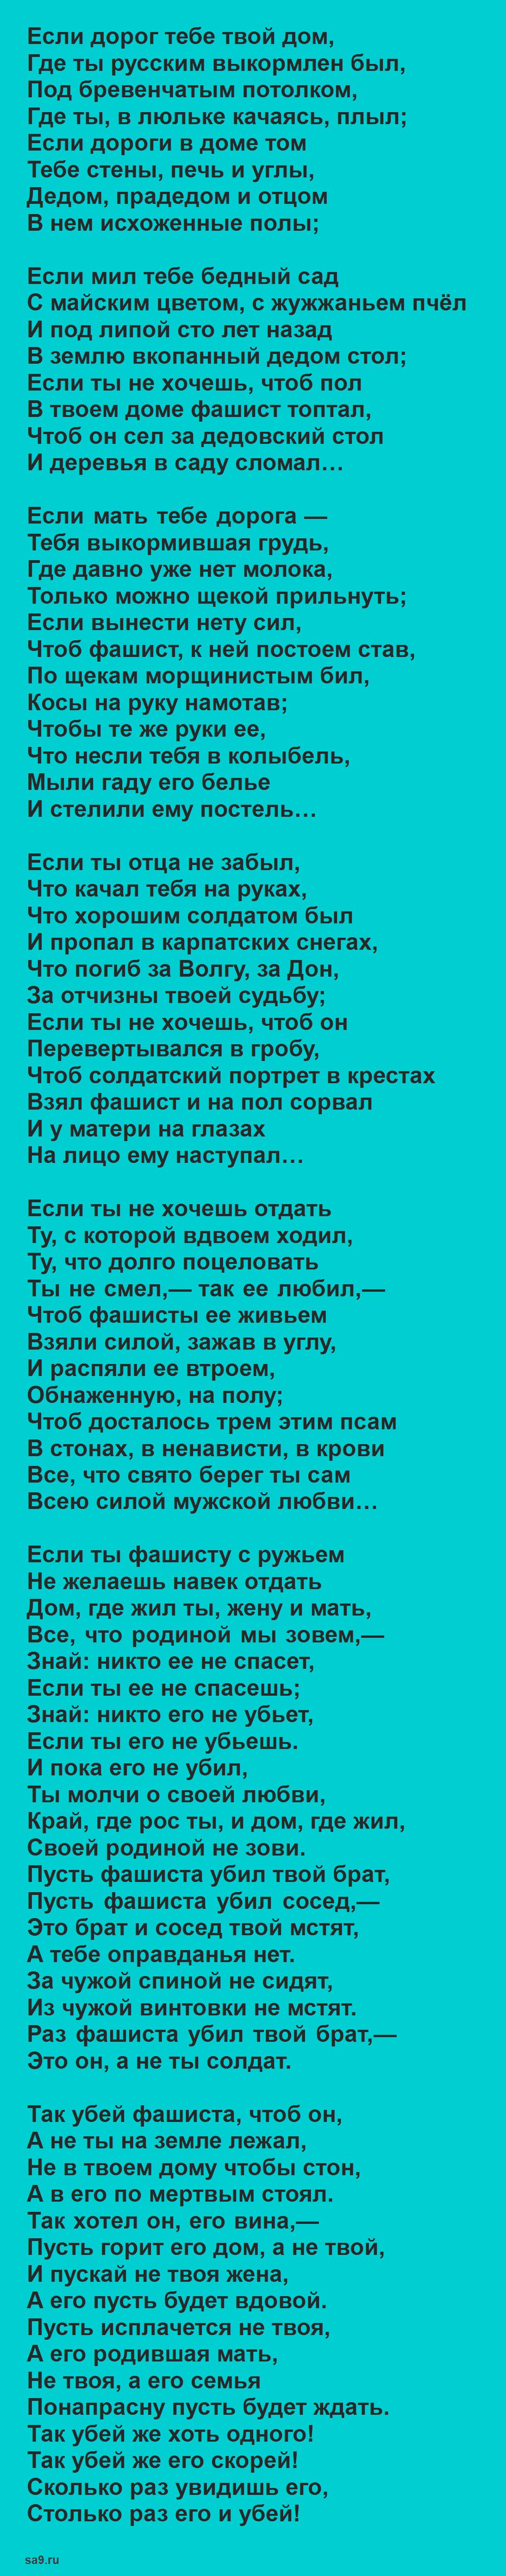 Стихи Симонова - Убей его